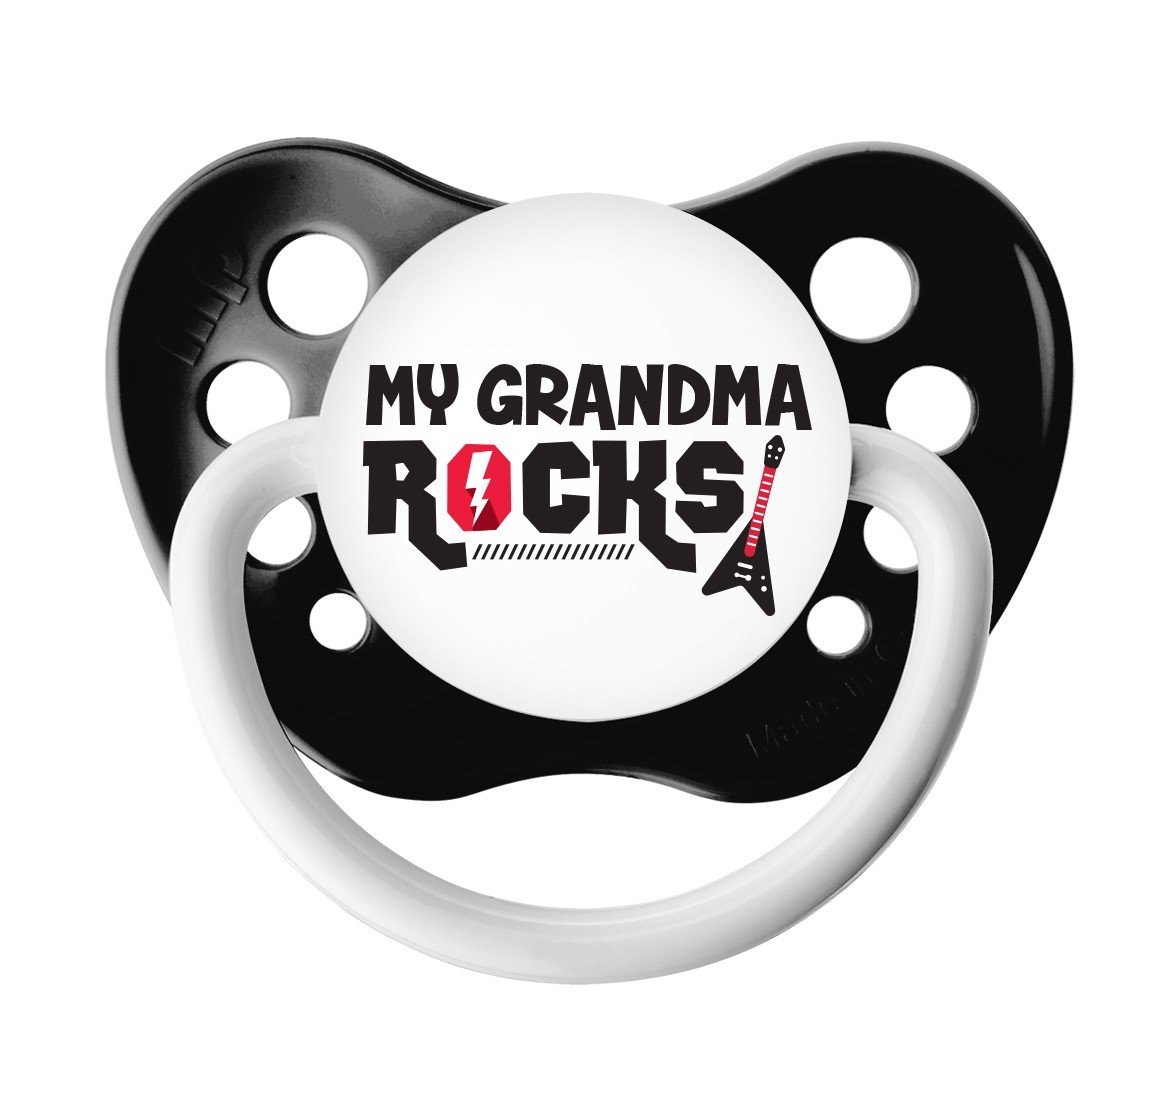 My Grandma Rocks Pacifier - Ulubulu - 6+ months - Black - Unisex - Guitar Binky